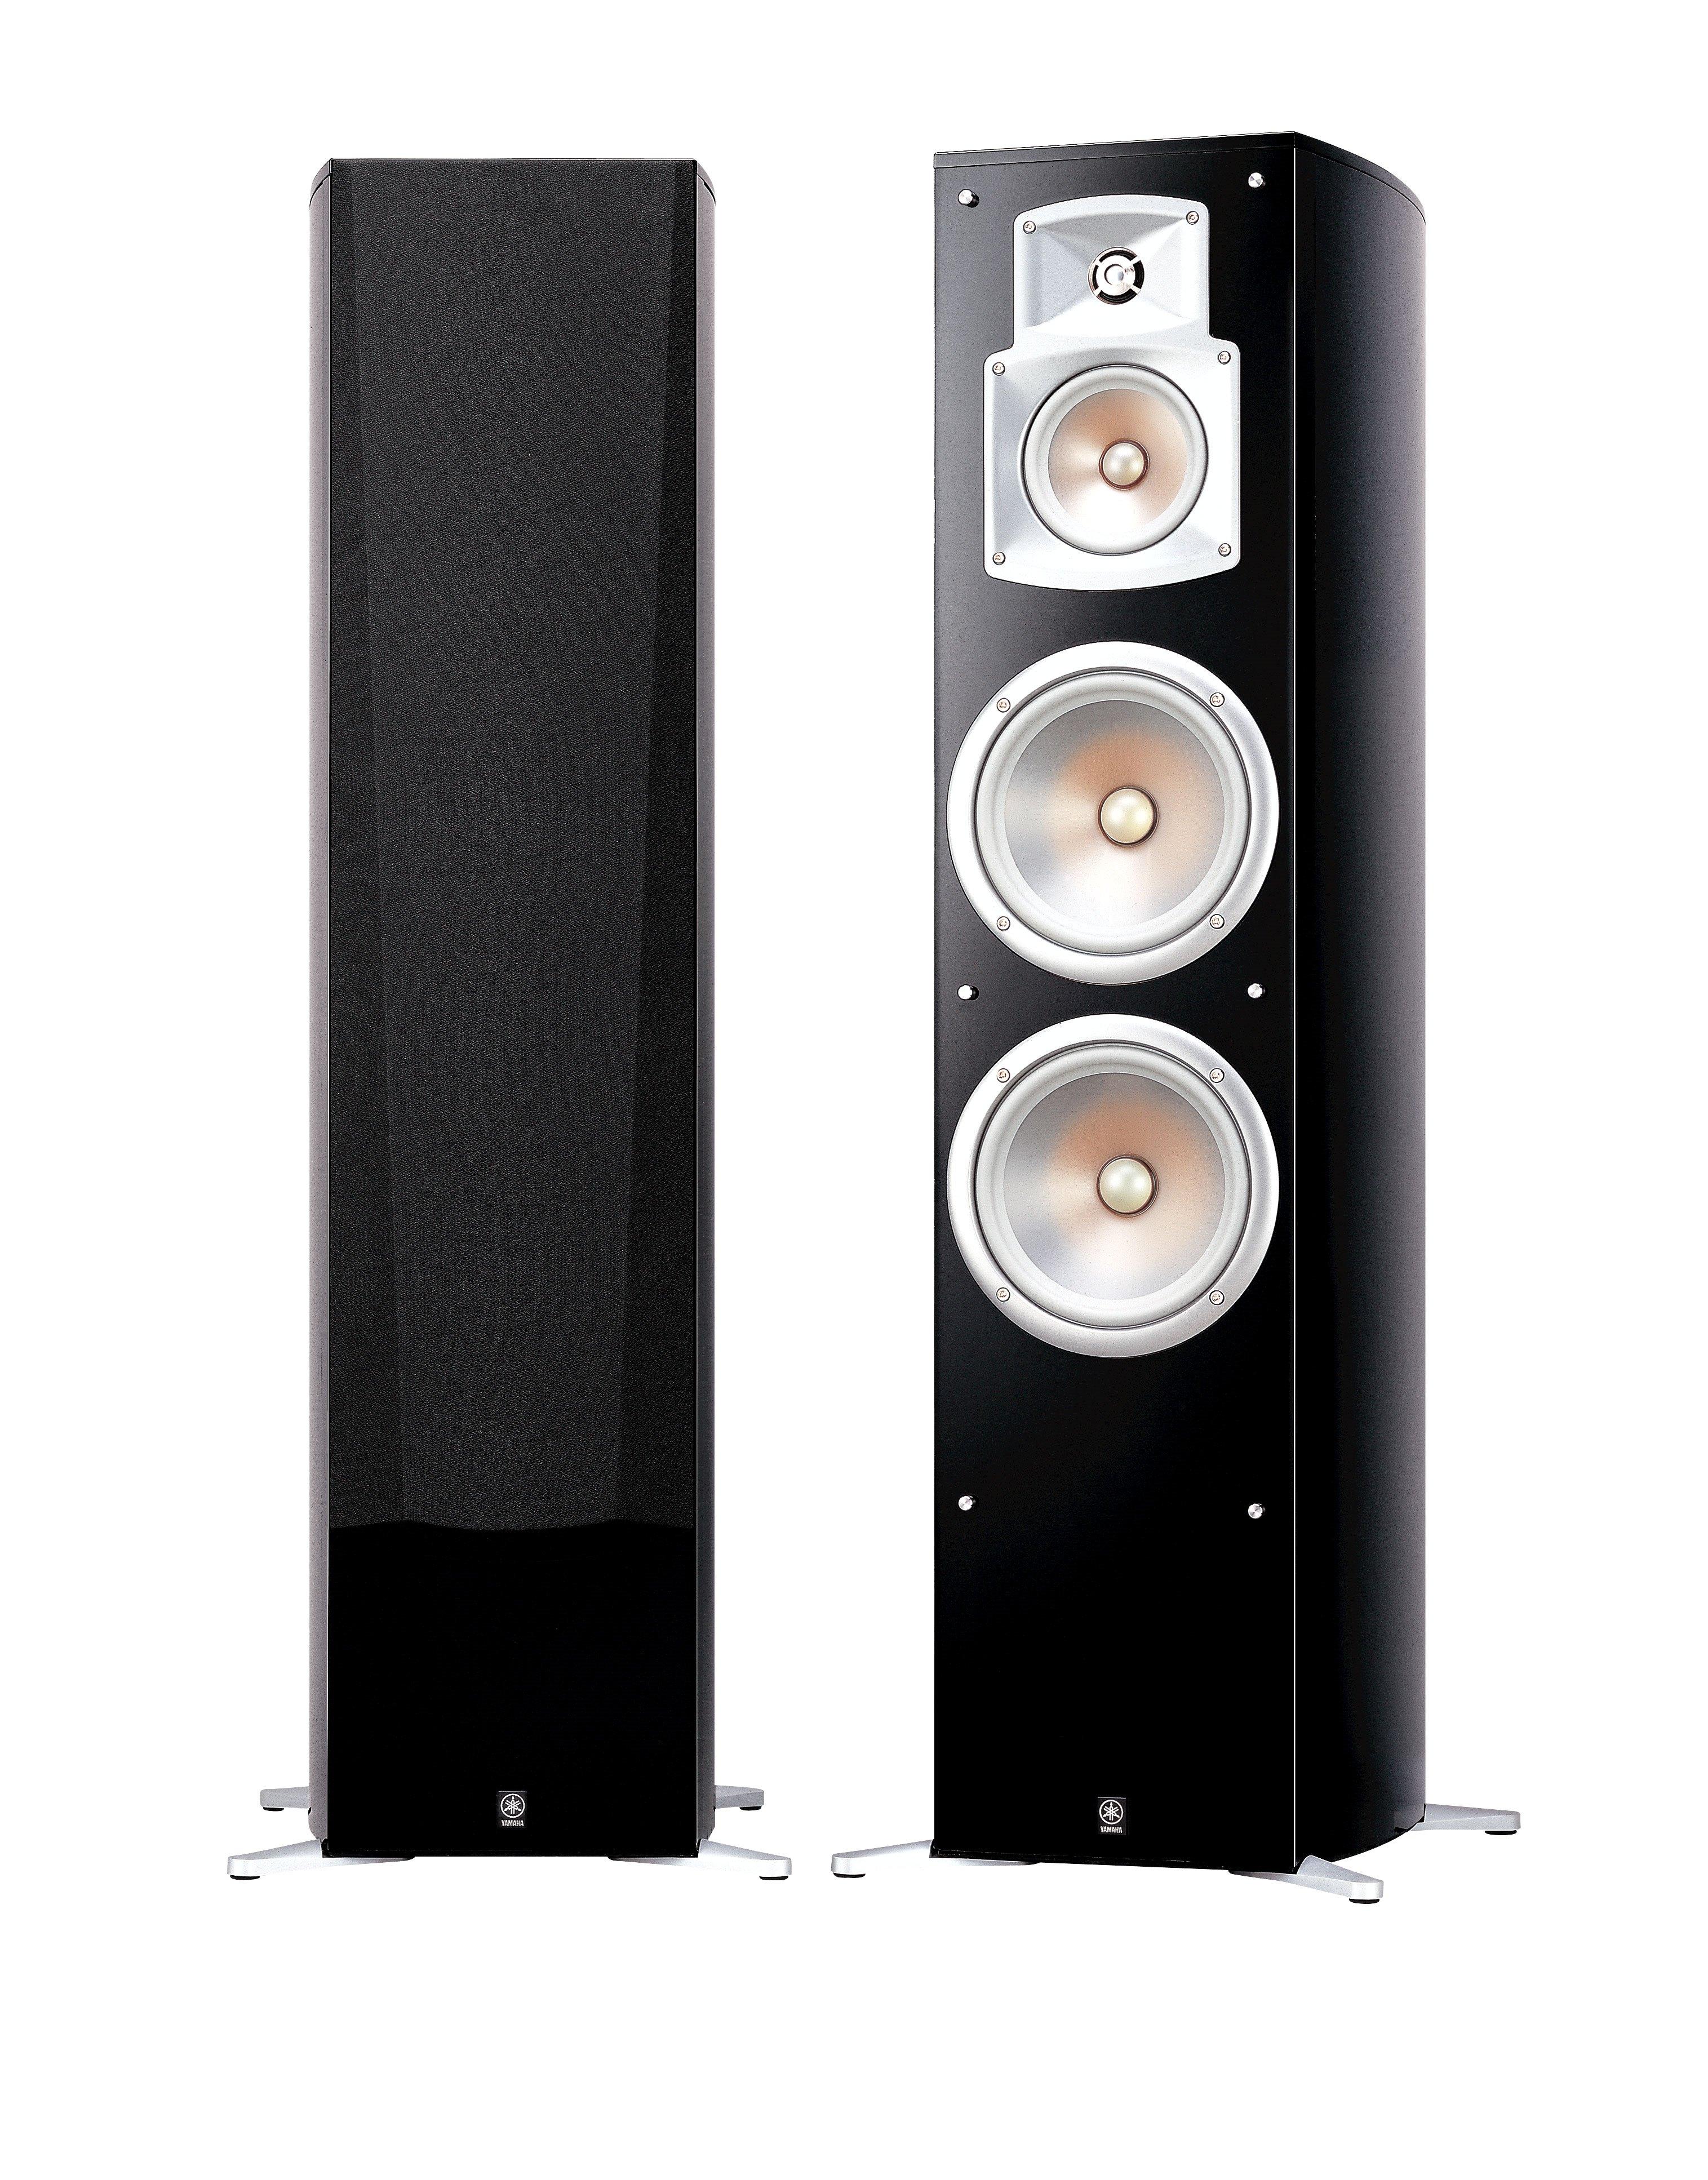 Högtalare - Ljud   Bild - Produkter - Yamaha - Sverige 66148e3b46823